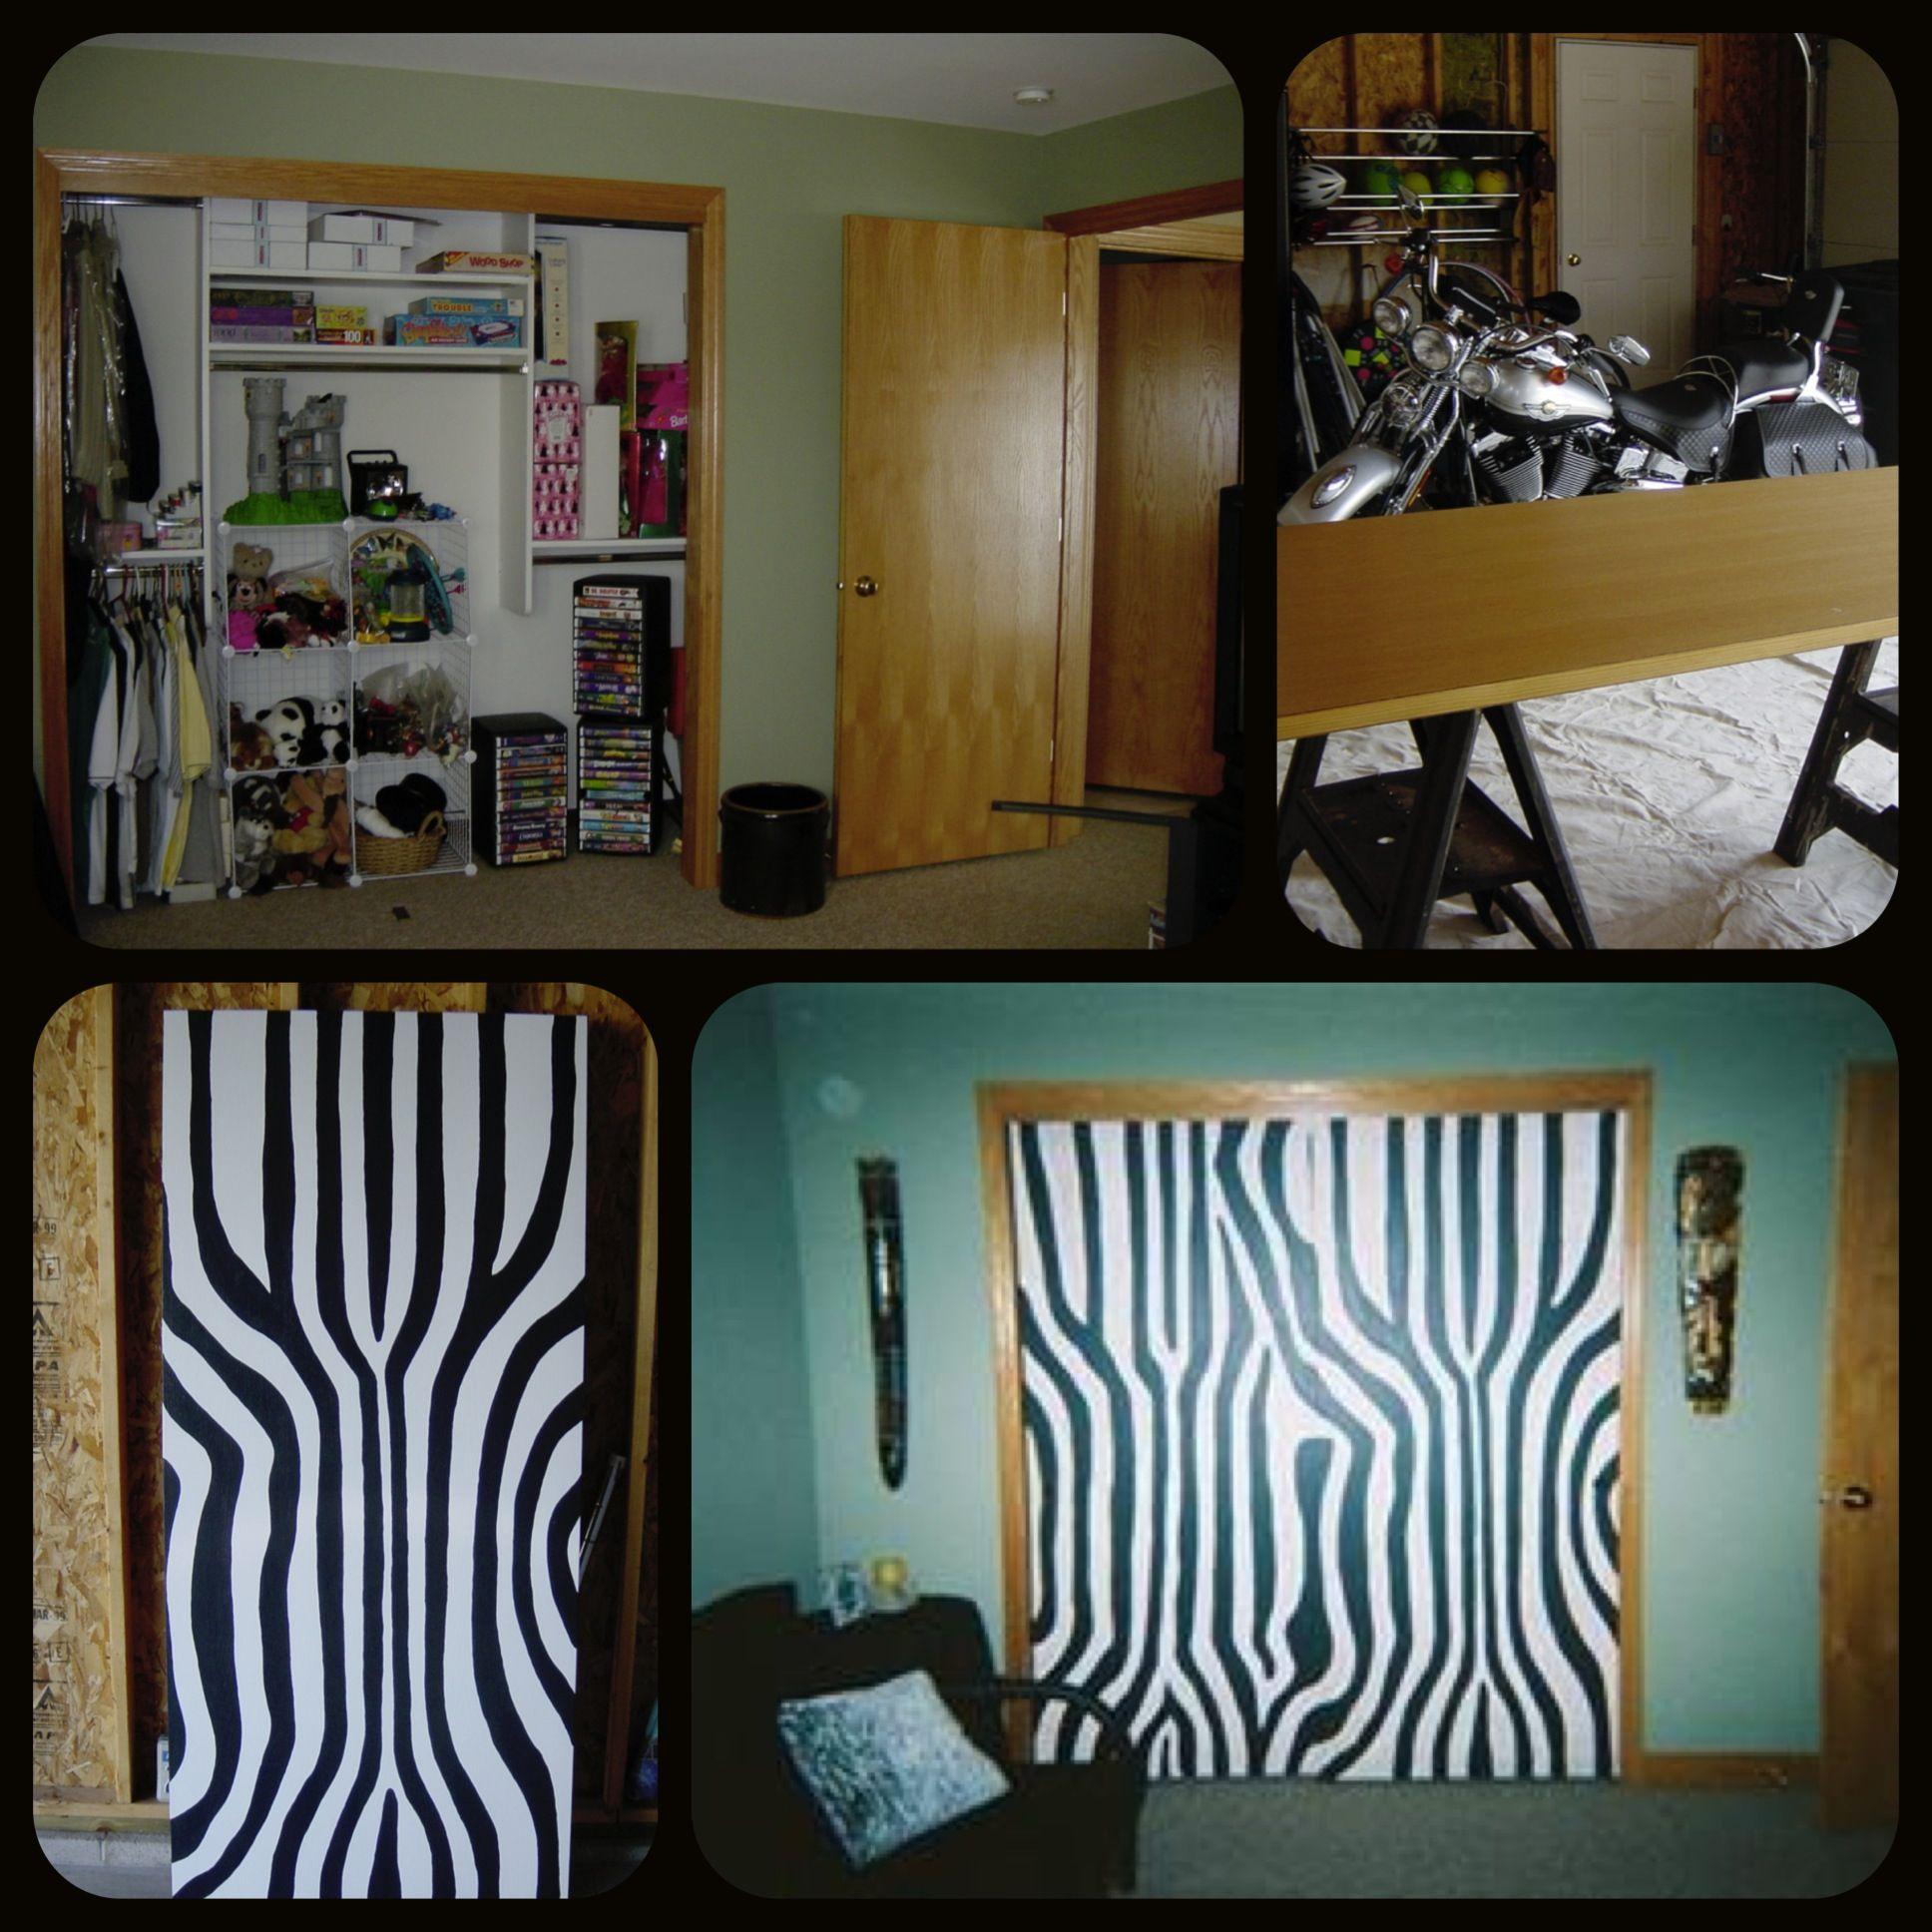 Zebra Painted Closet Doors In A Jungle Theme Room I Used A Zebra